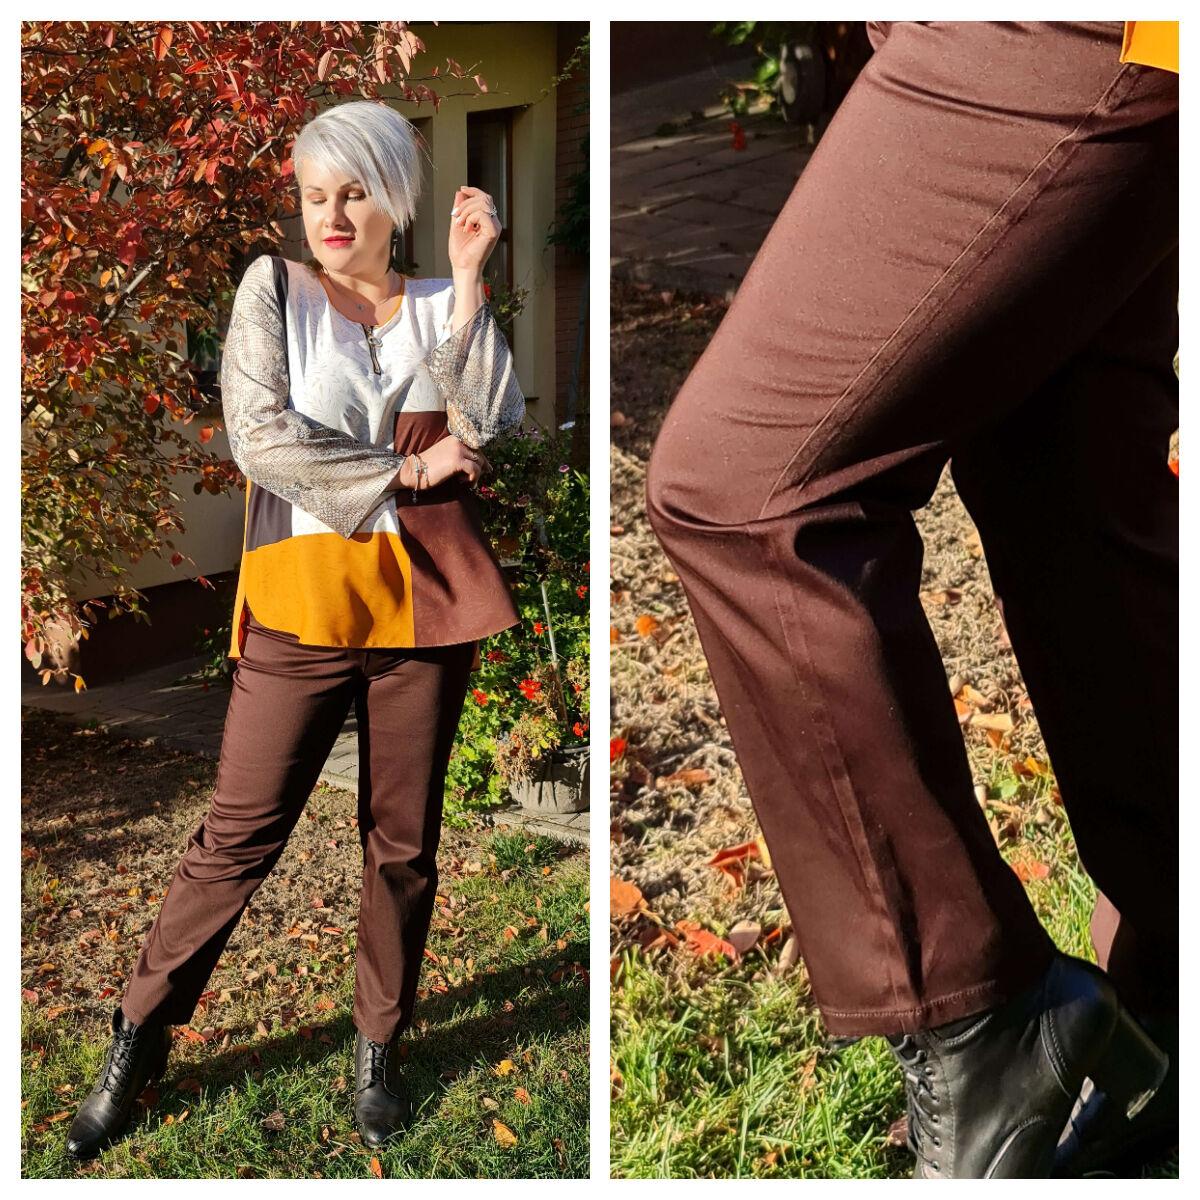 Cipóra nadrág - nagyméretű barna nadrág